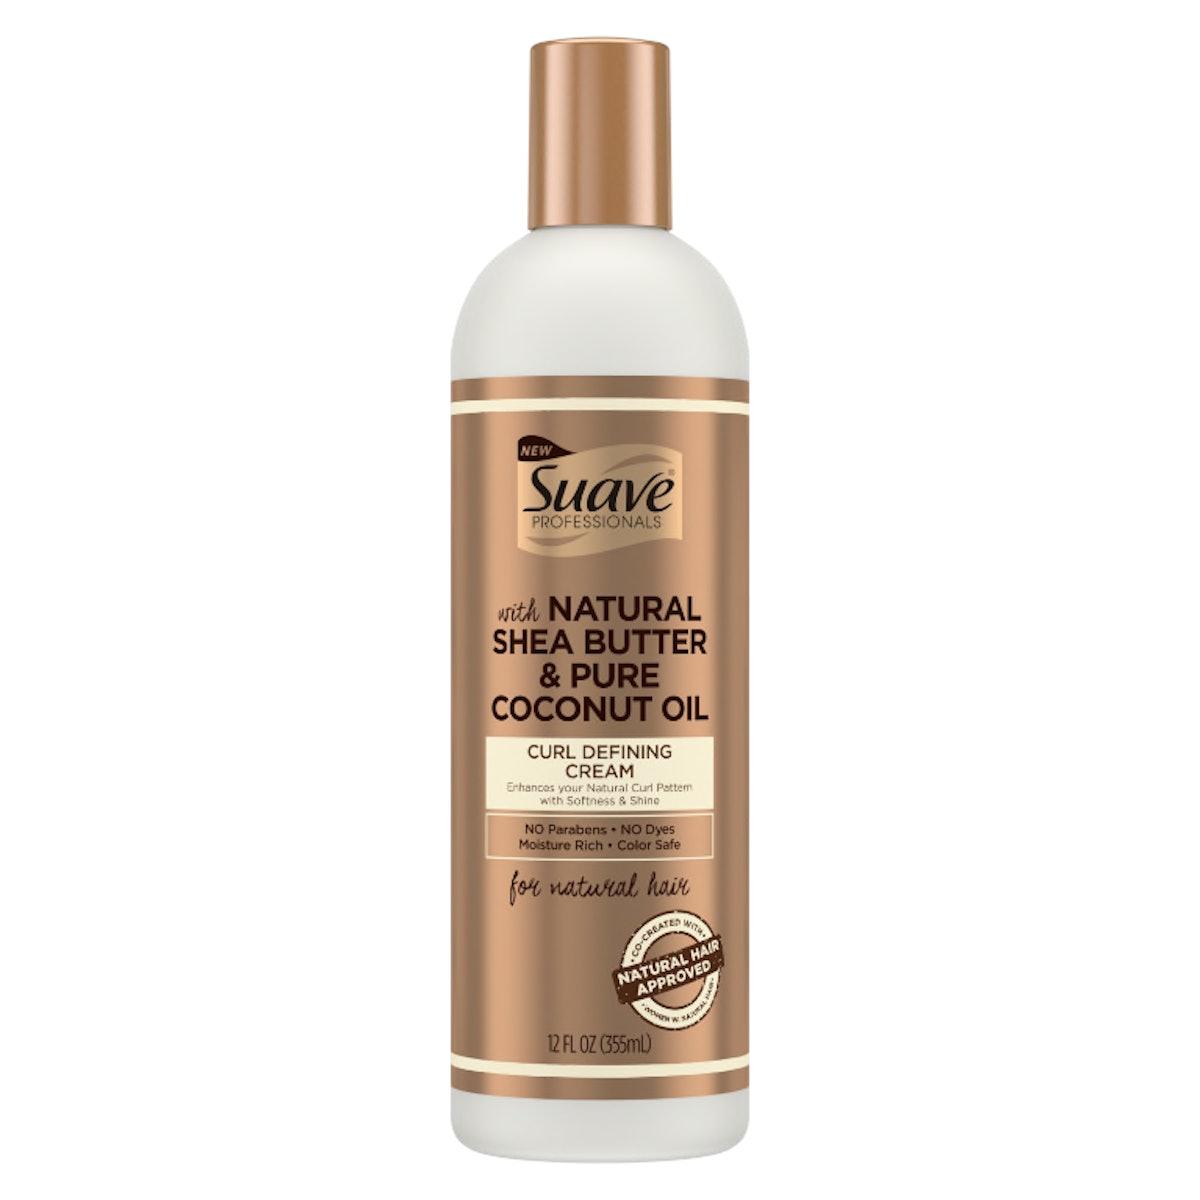 Suave Professionals for Natural Hair Curl Defining Cream